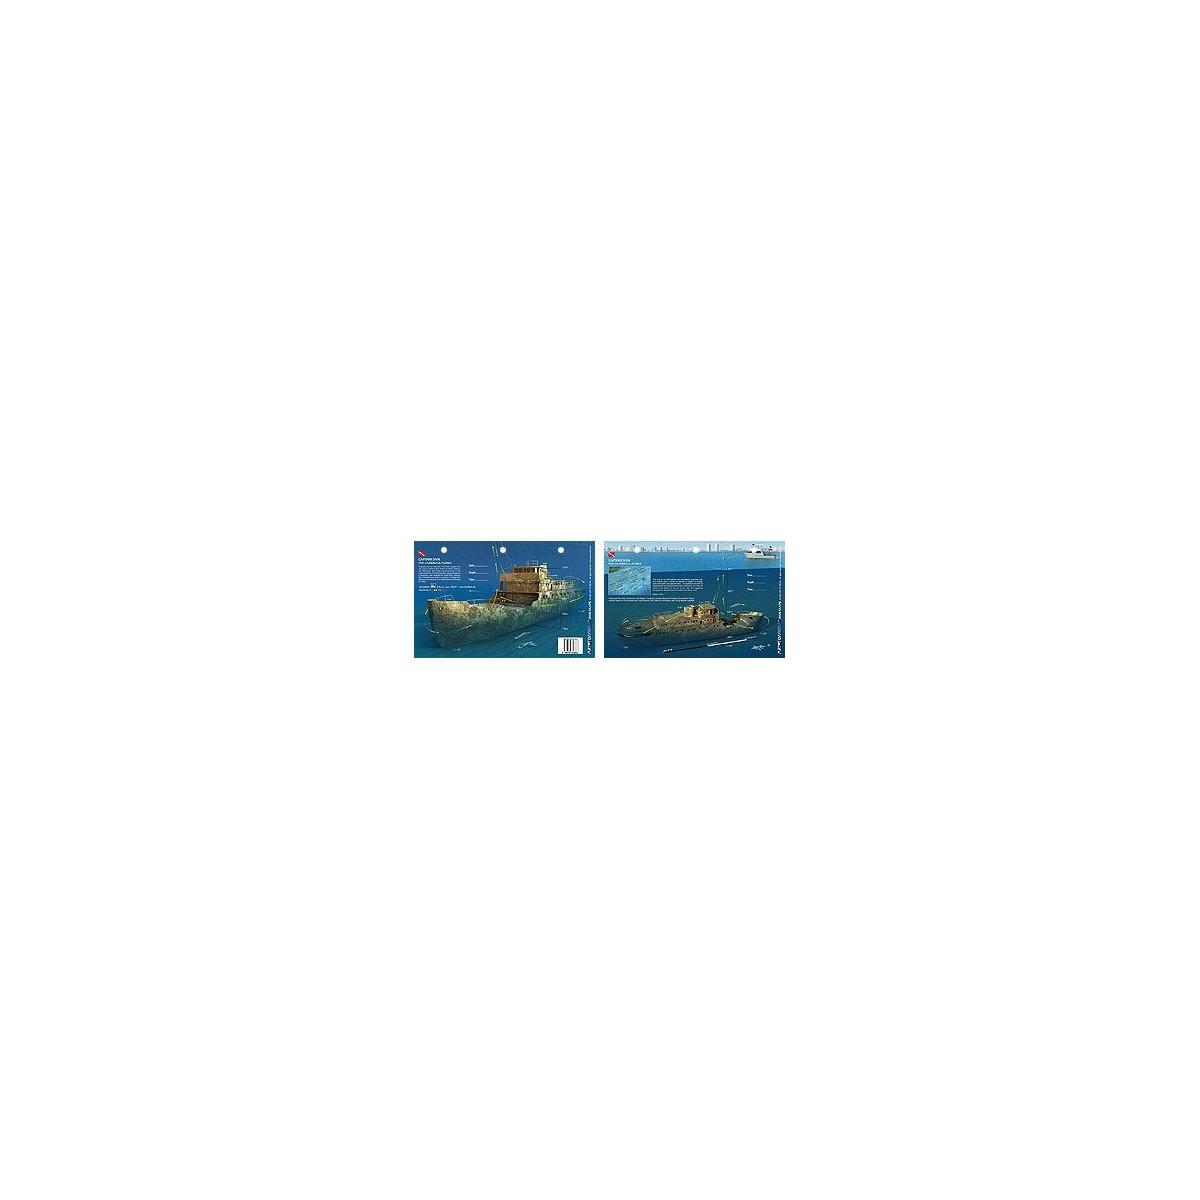 Captain Dan in Fort Lauderdale, Florida (8.5 x 5.5 Inches) (21.6 x 15cm) - New Art to Media Underwater Waterproof 3D Dive Site M